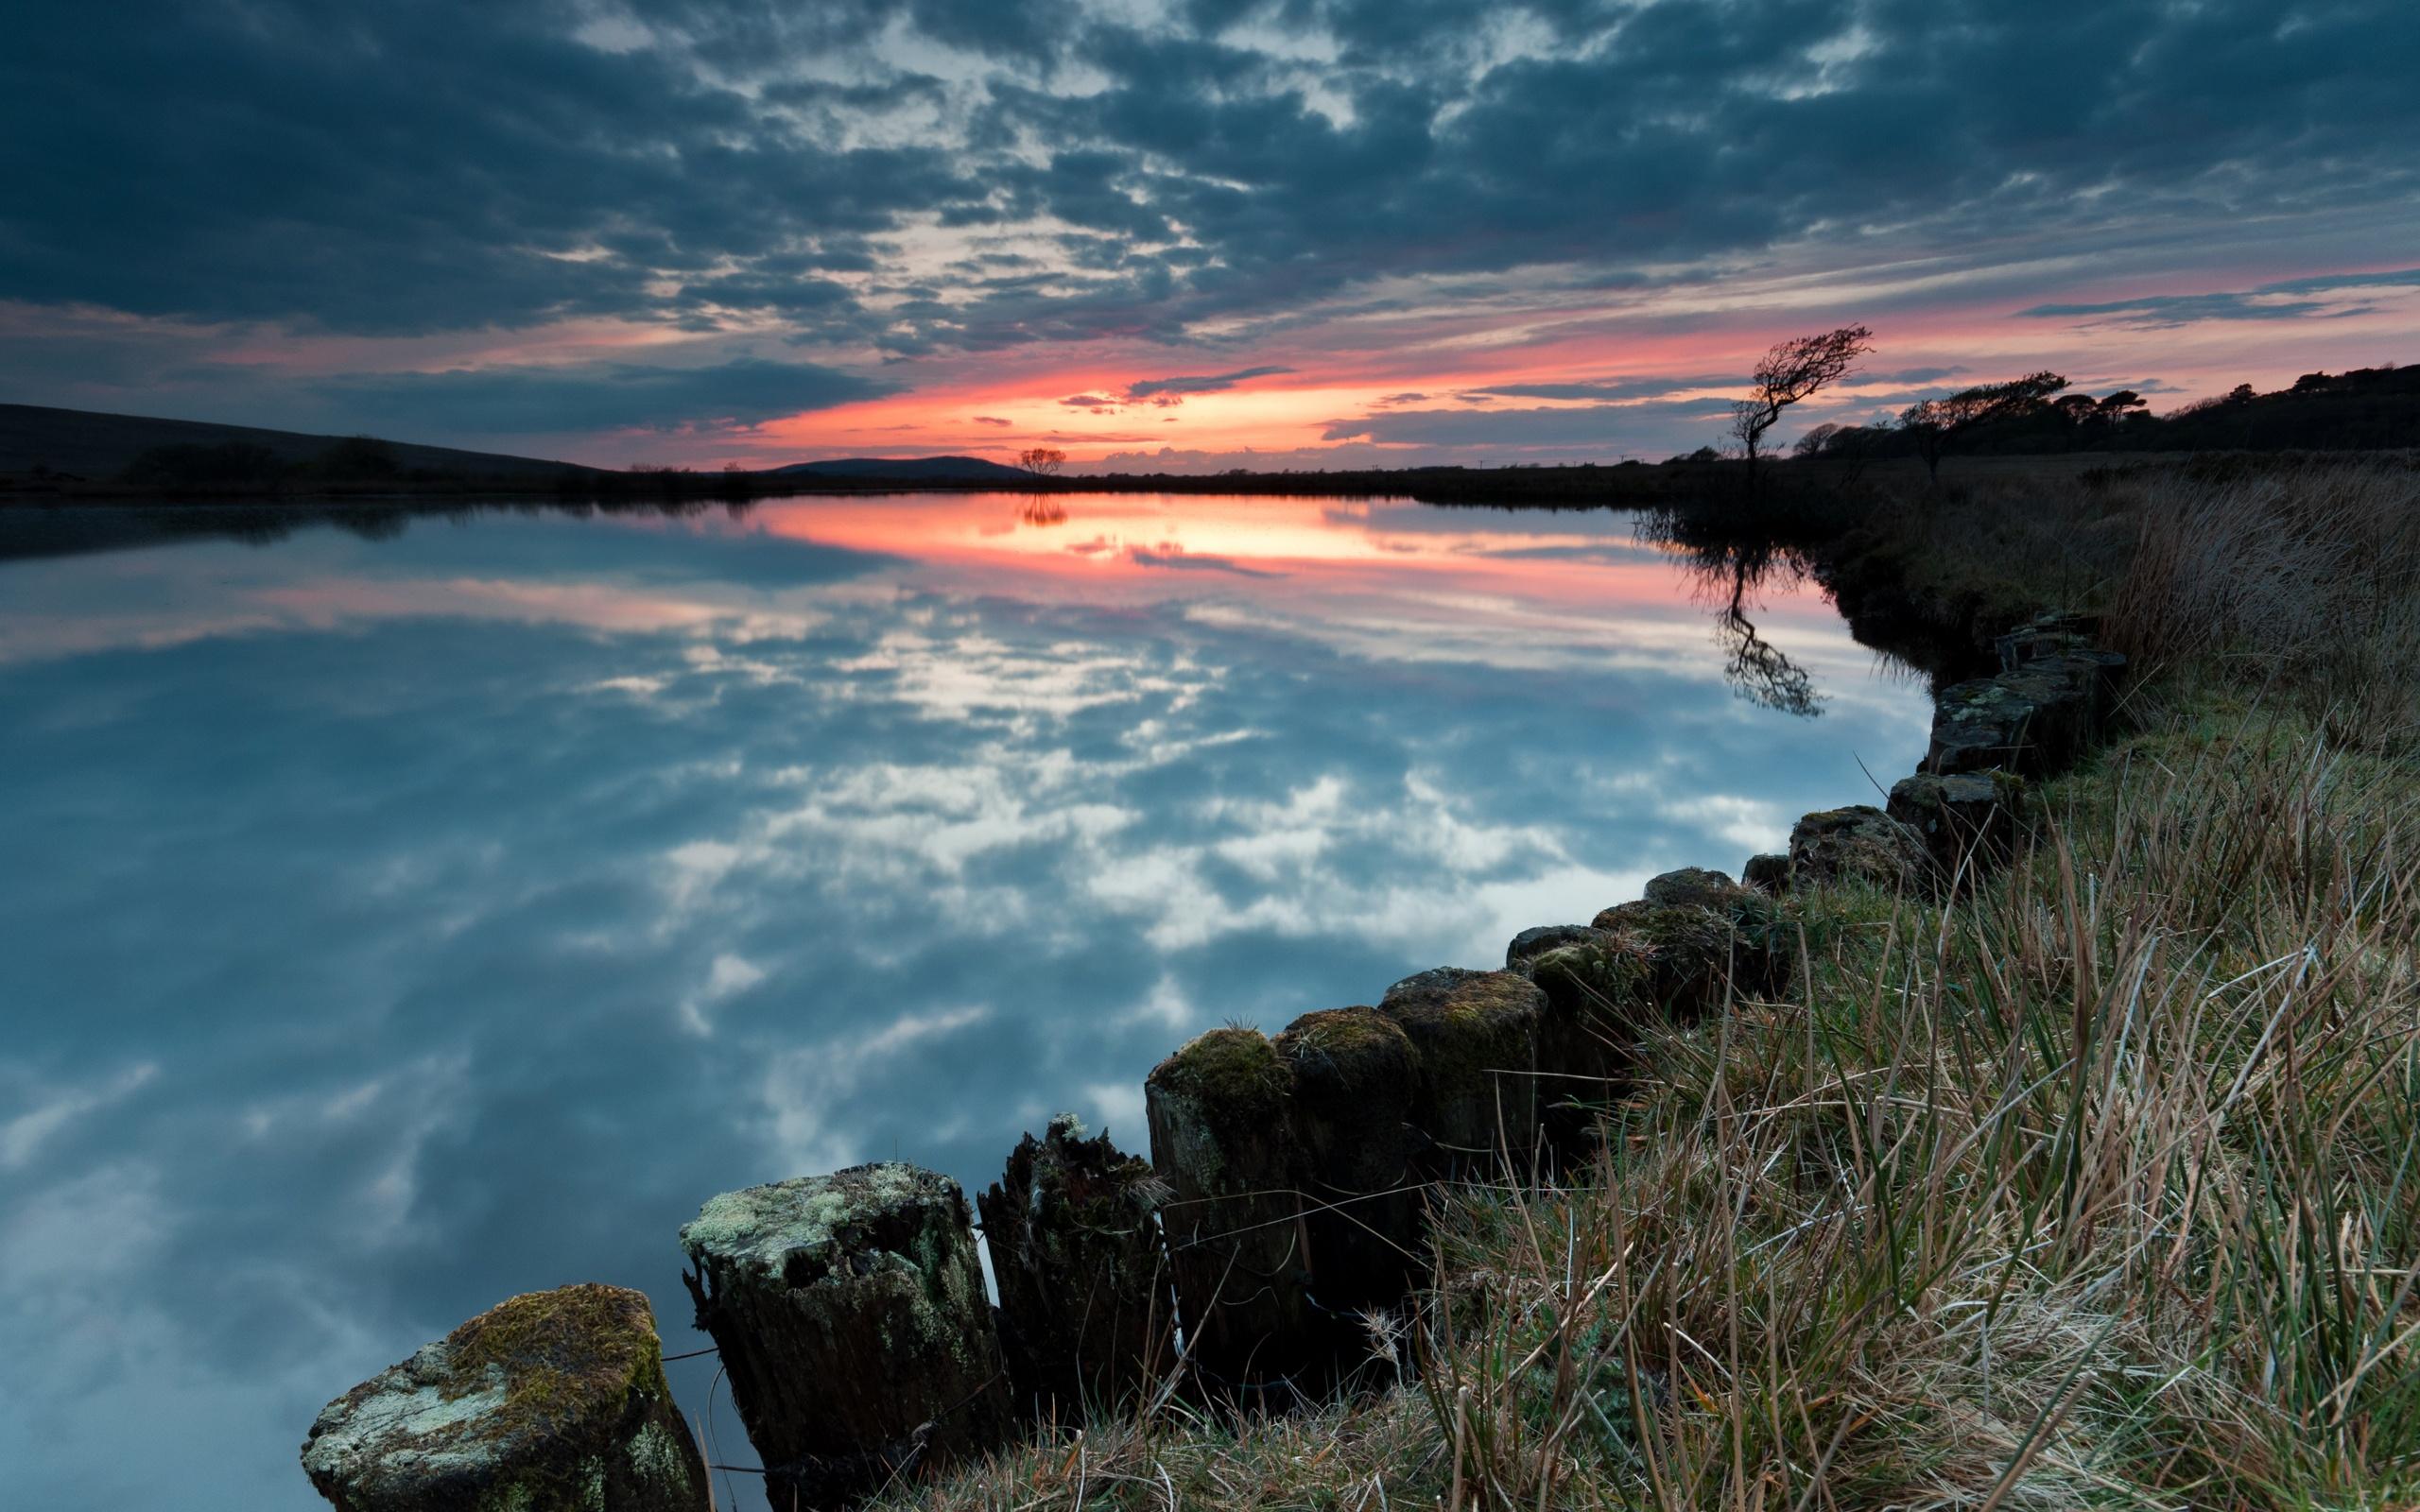 Evening Sunset Lake Wallpapers   2560x1600   1261618 2560x1600